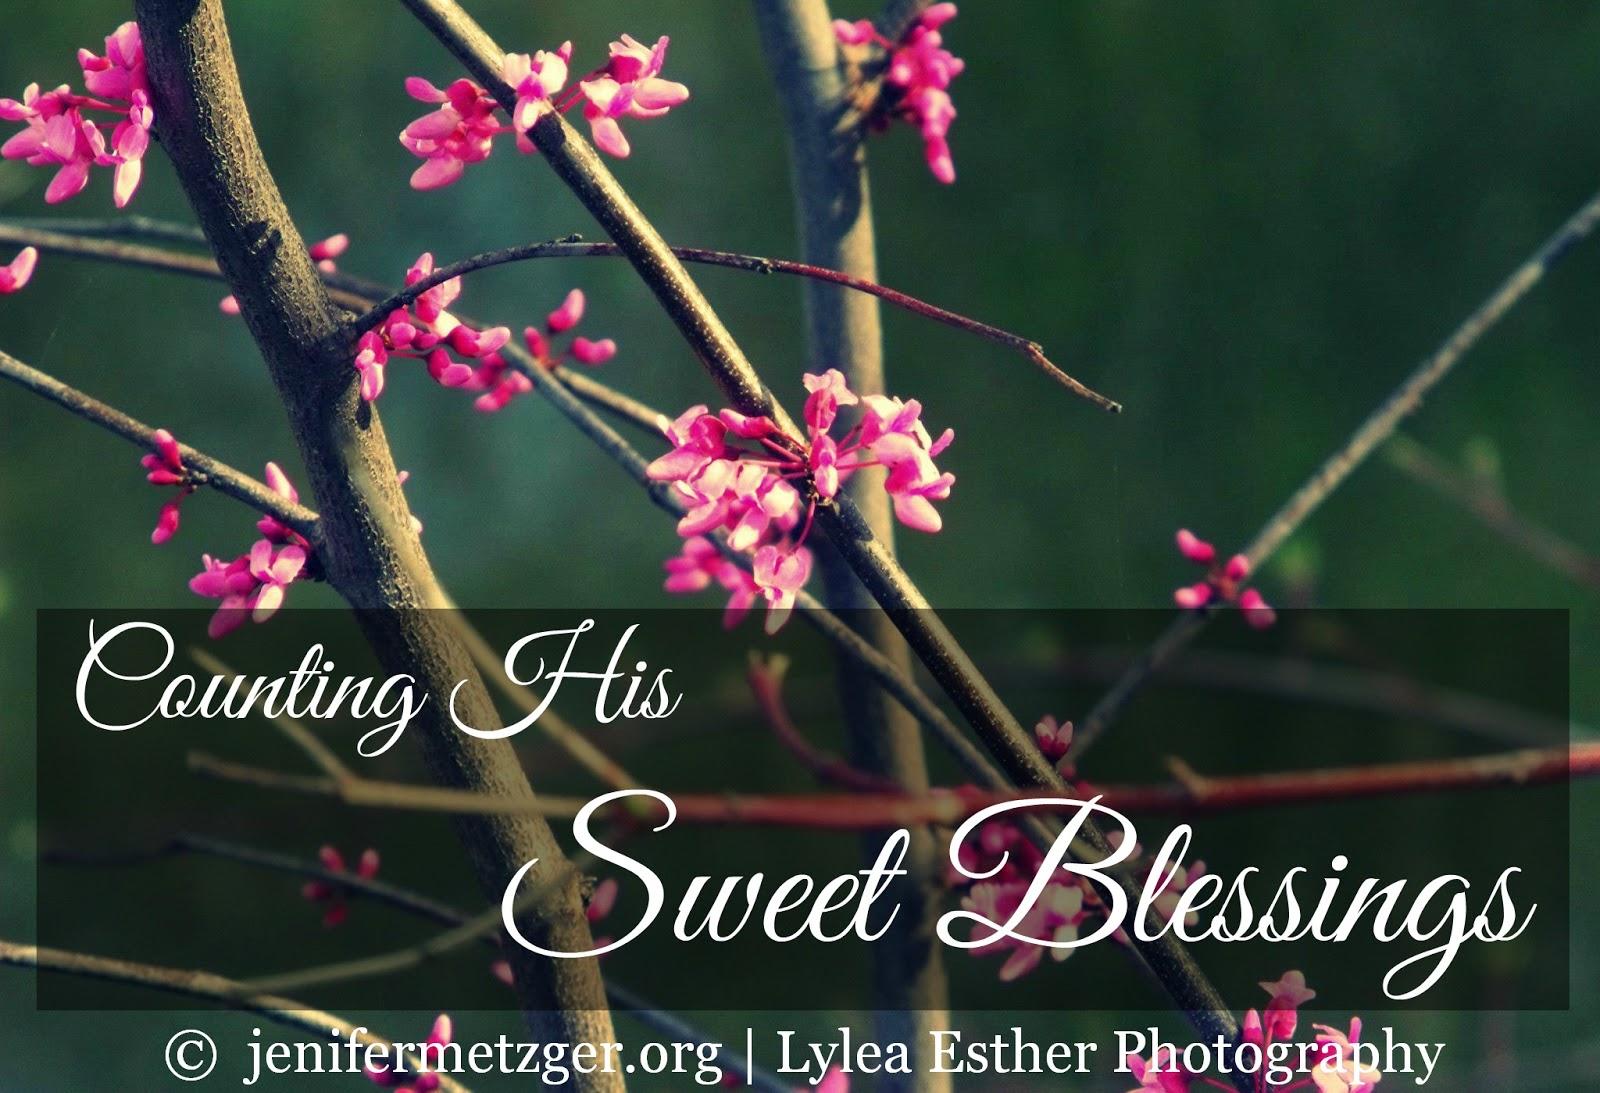 #eucharisteo #thanksgiving #joydare #praises